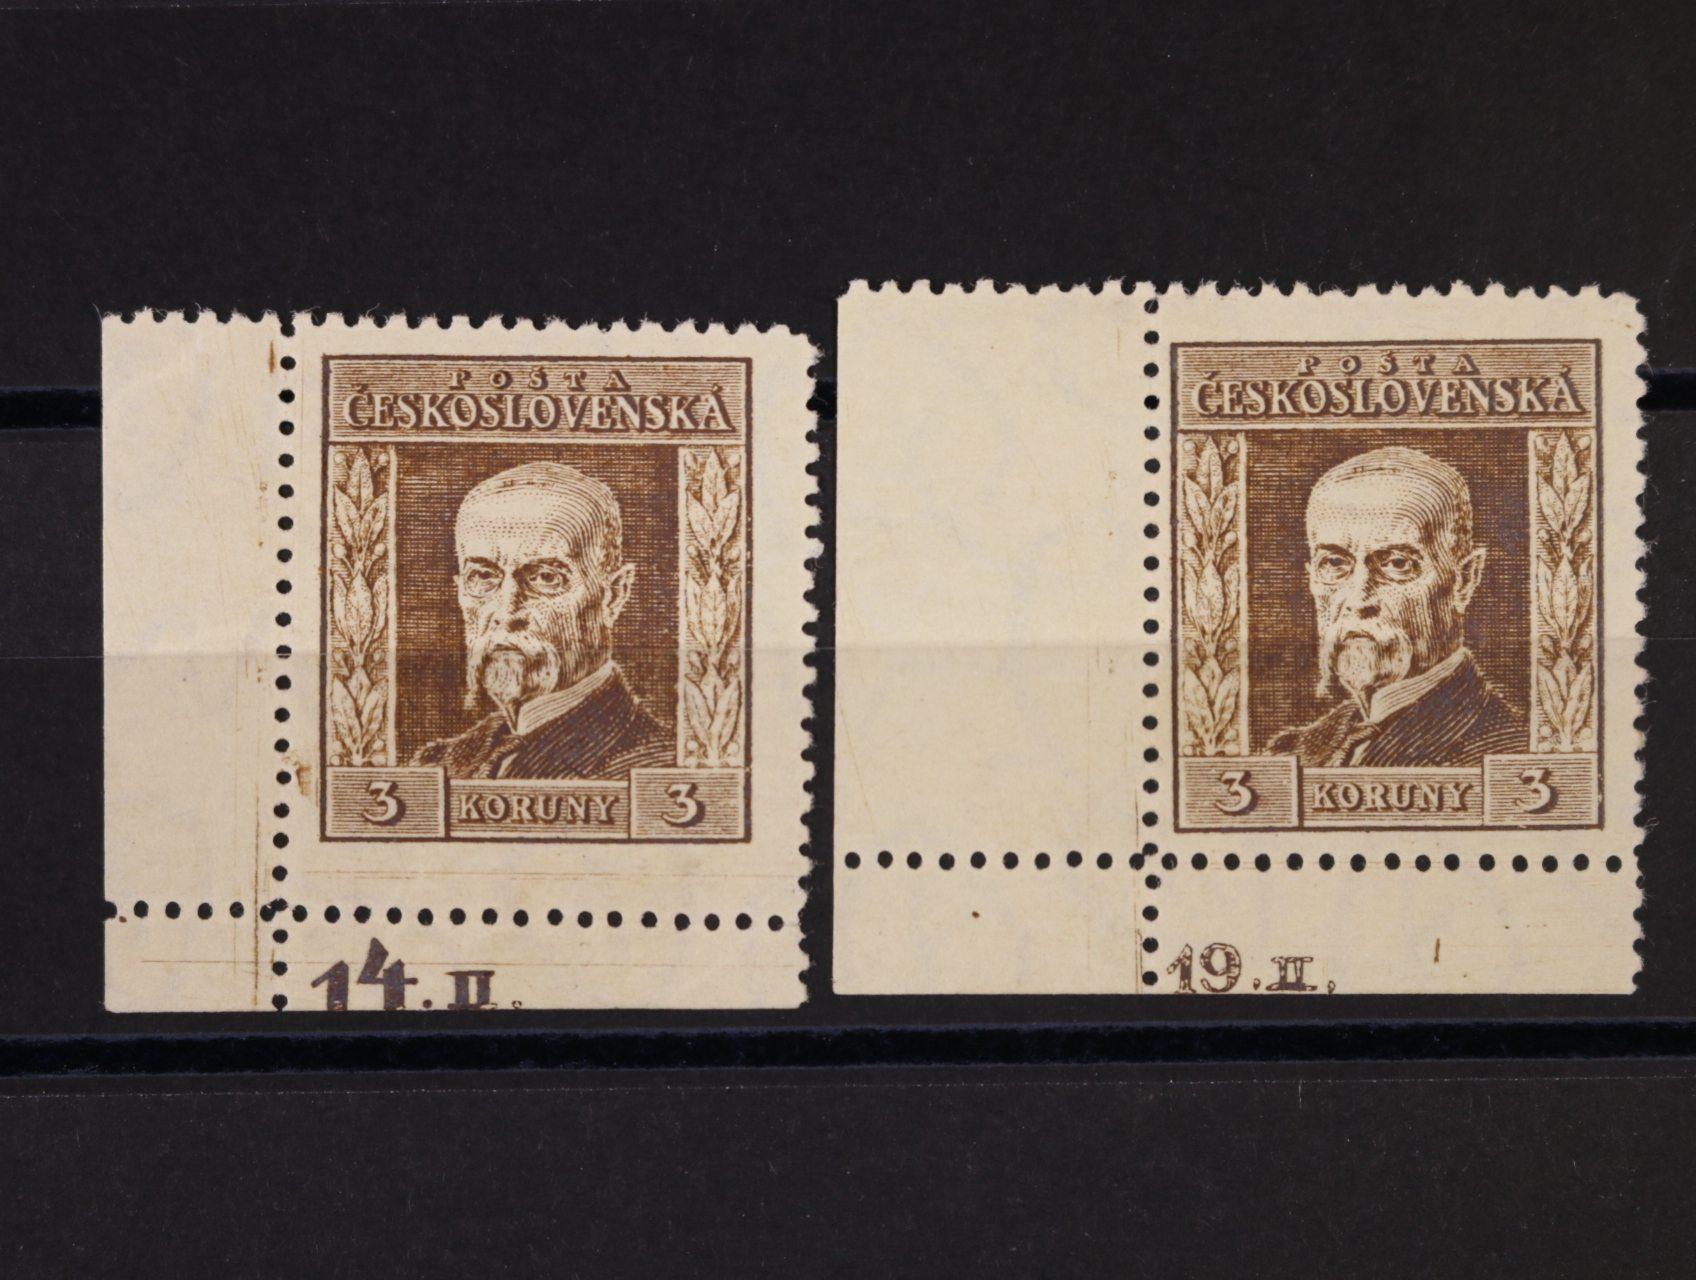 zn. č. 191 B, pr. 5, dtto pr. 7 - levé spodní roh. kusy s DZ 14.II., resp. 19. II.